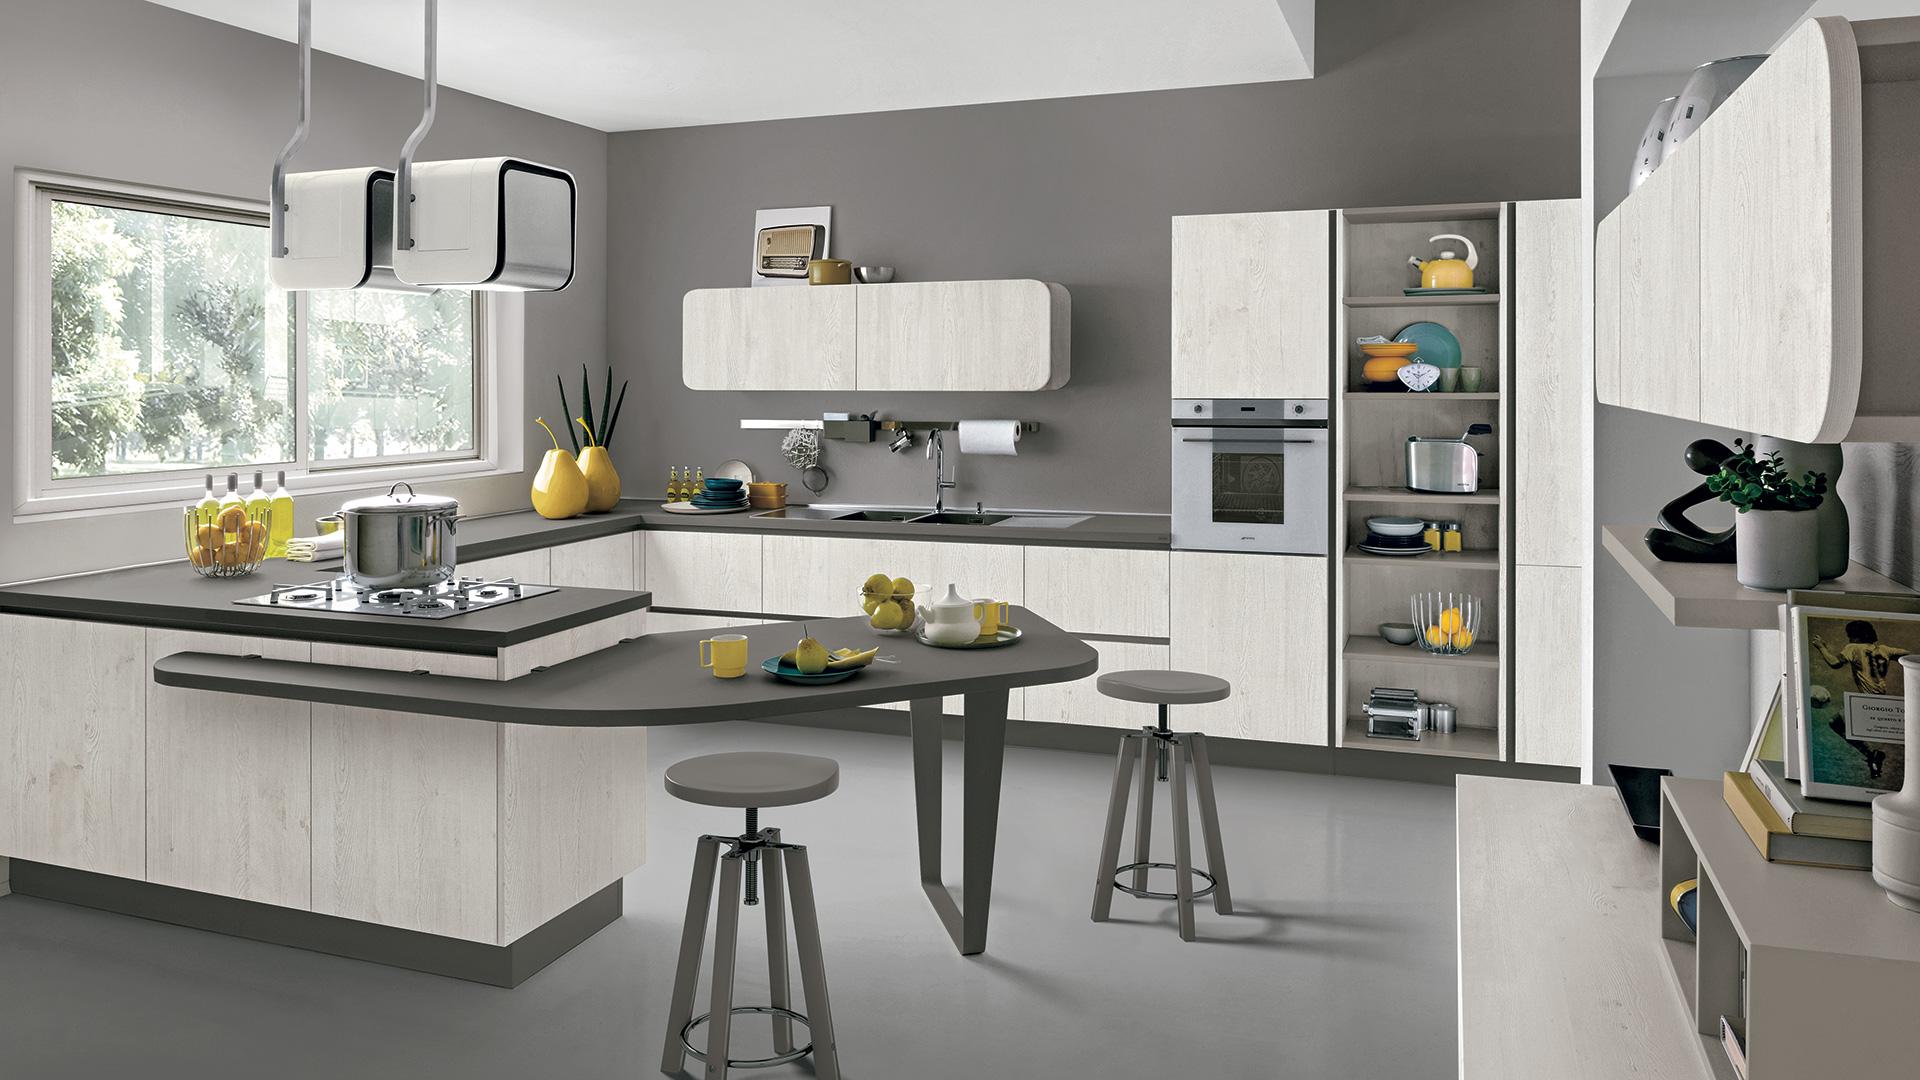 Immagina Neck - Modern Kitchens